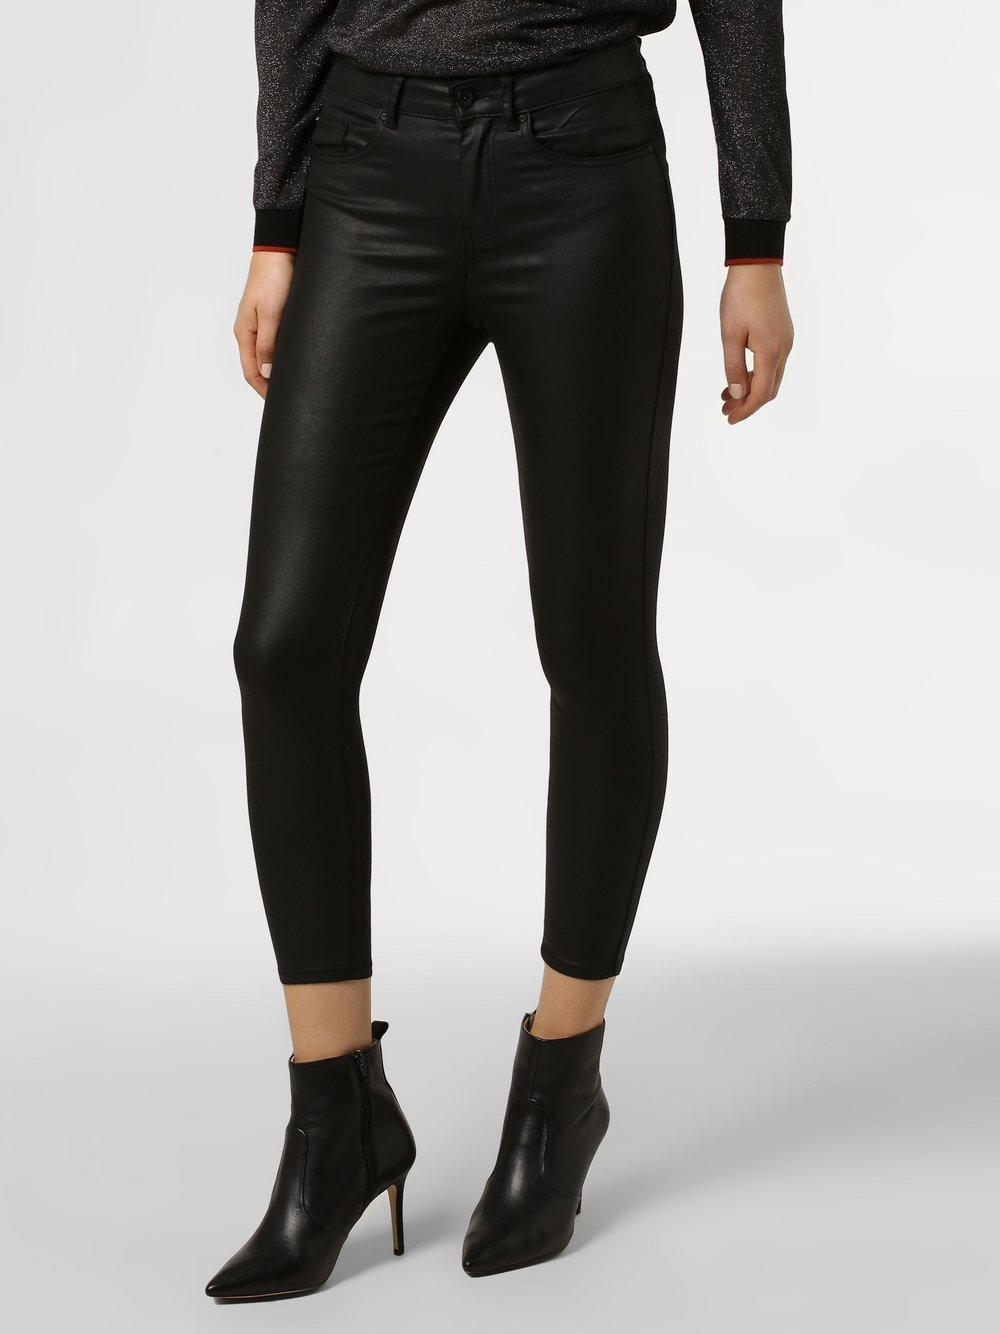 ONLY - Spodnie damskie – Onlhush, czarny